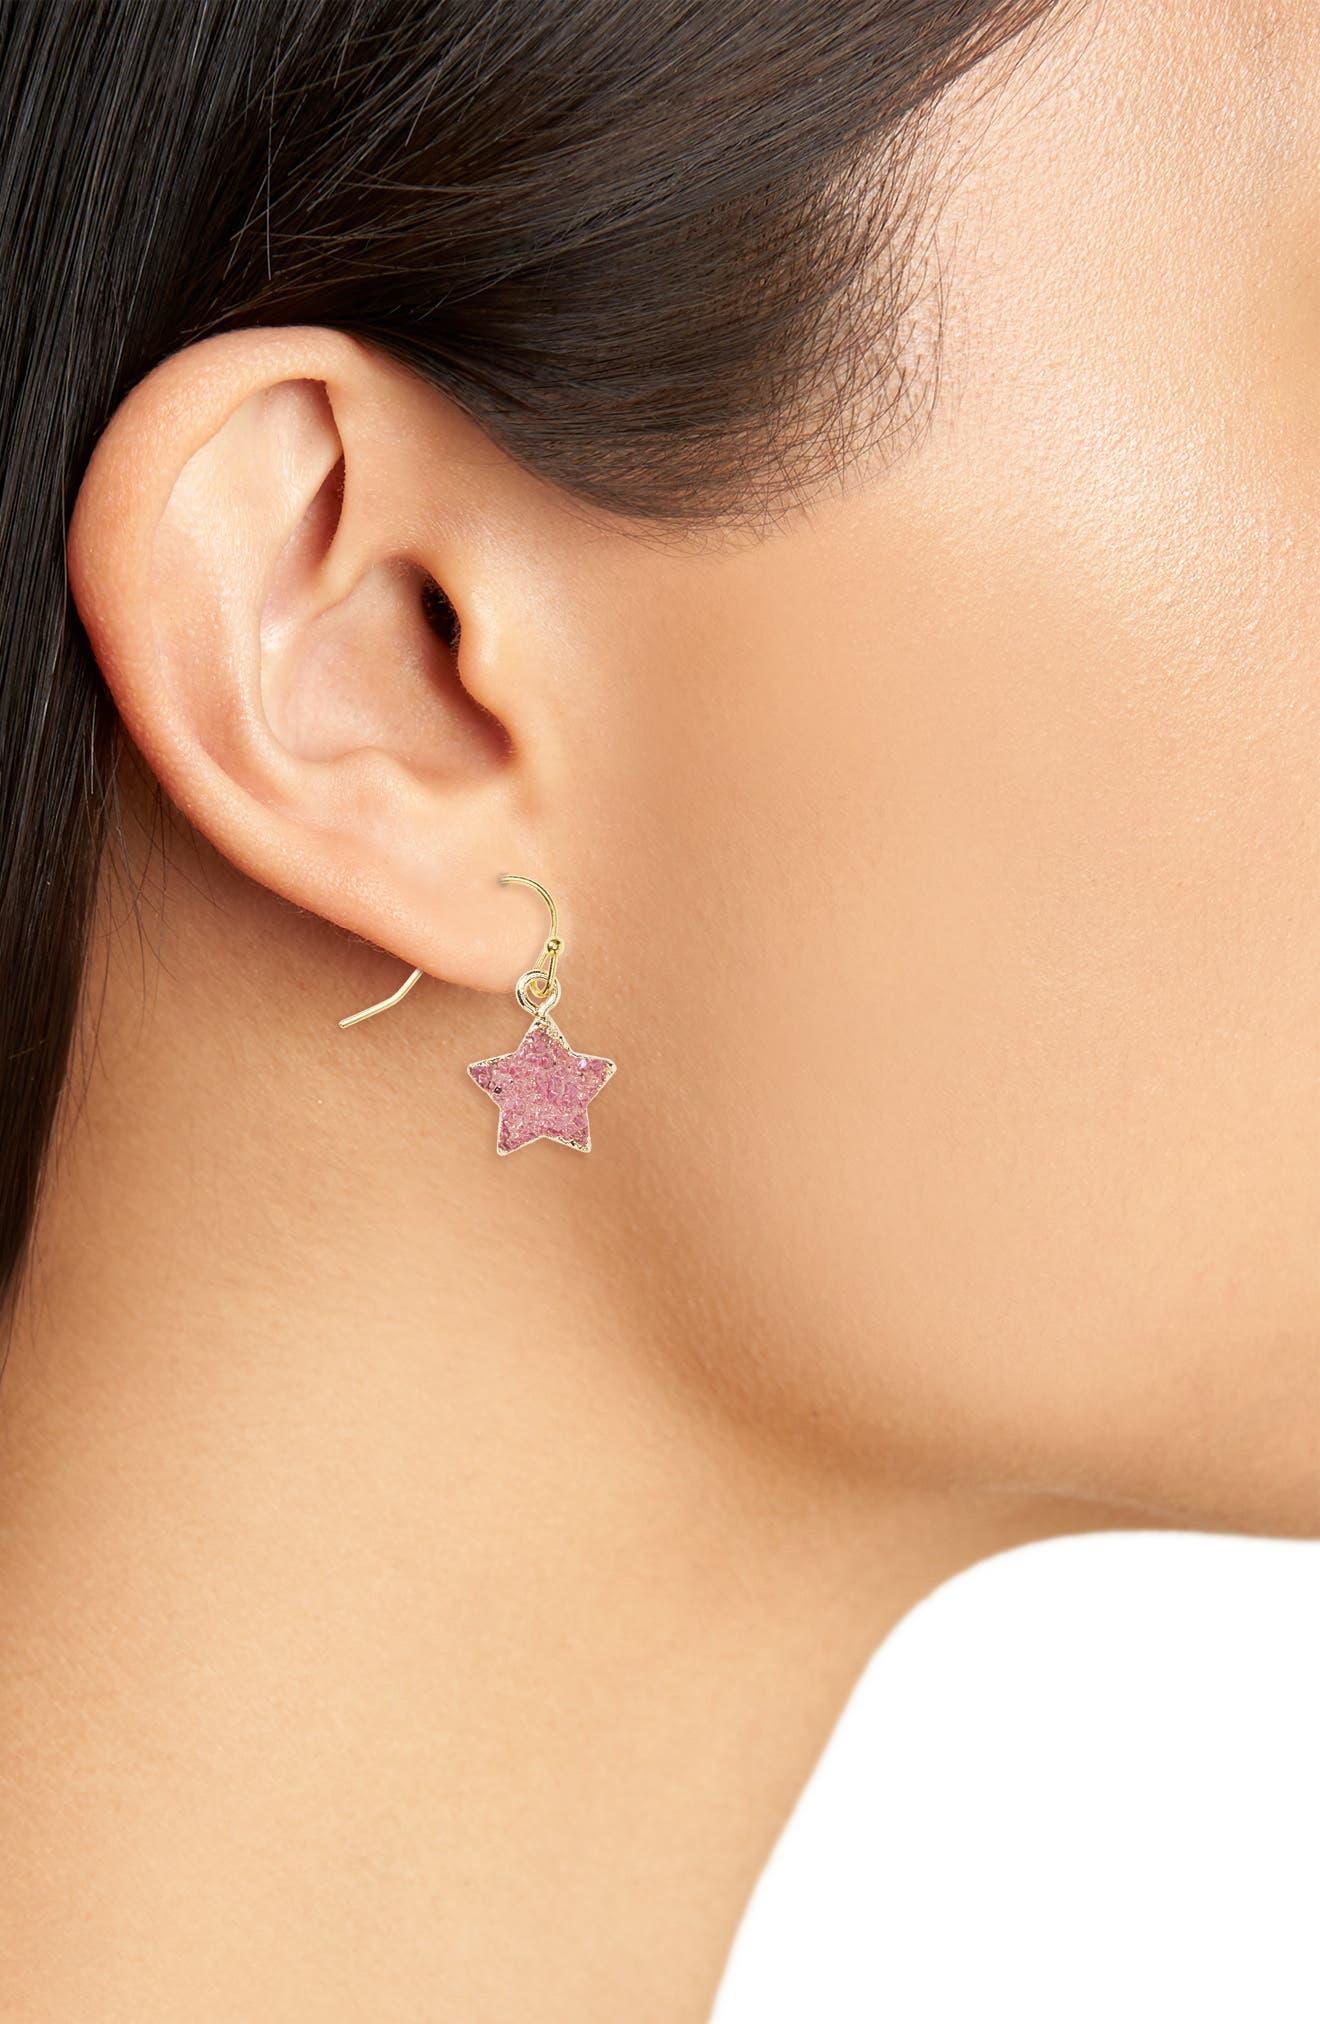 Moon & Star Drusy Stone Earrings,                             Alternate thumbnail 2, color,                             400